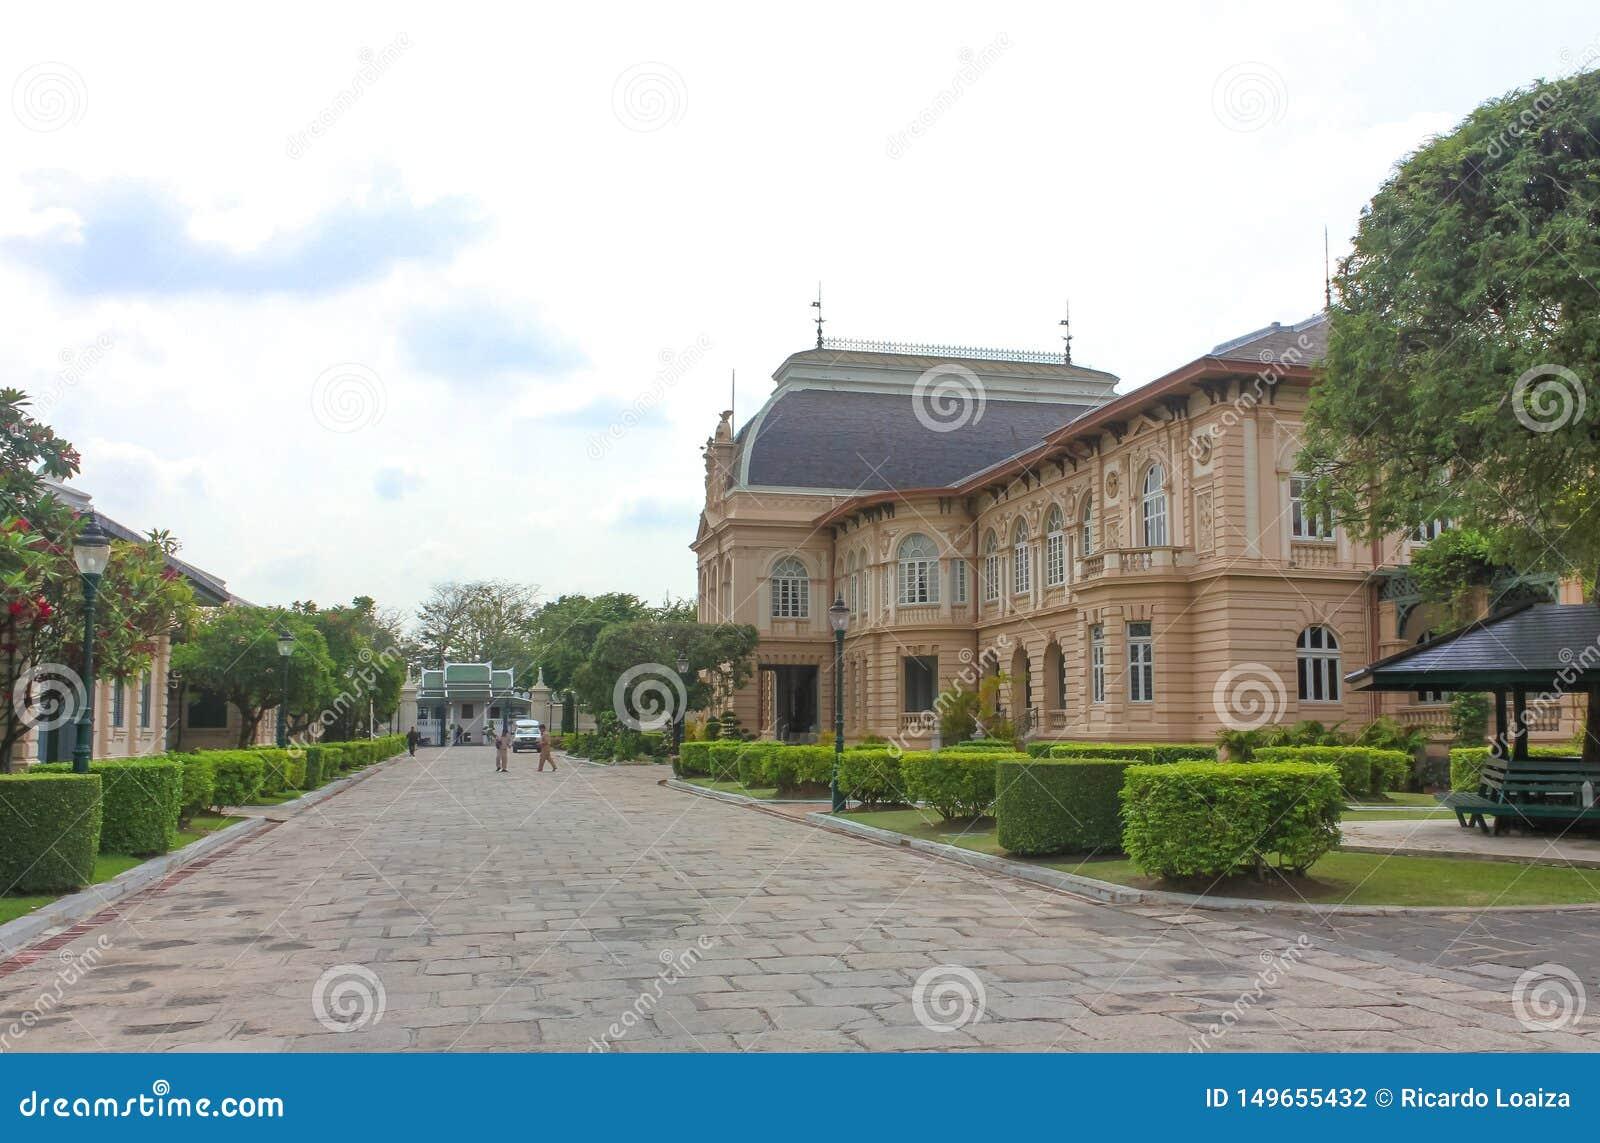 Phra Thinang Boromphiman, residence of Thai kings in the Grand Palace, Bangkok